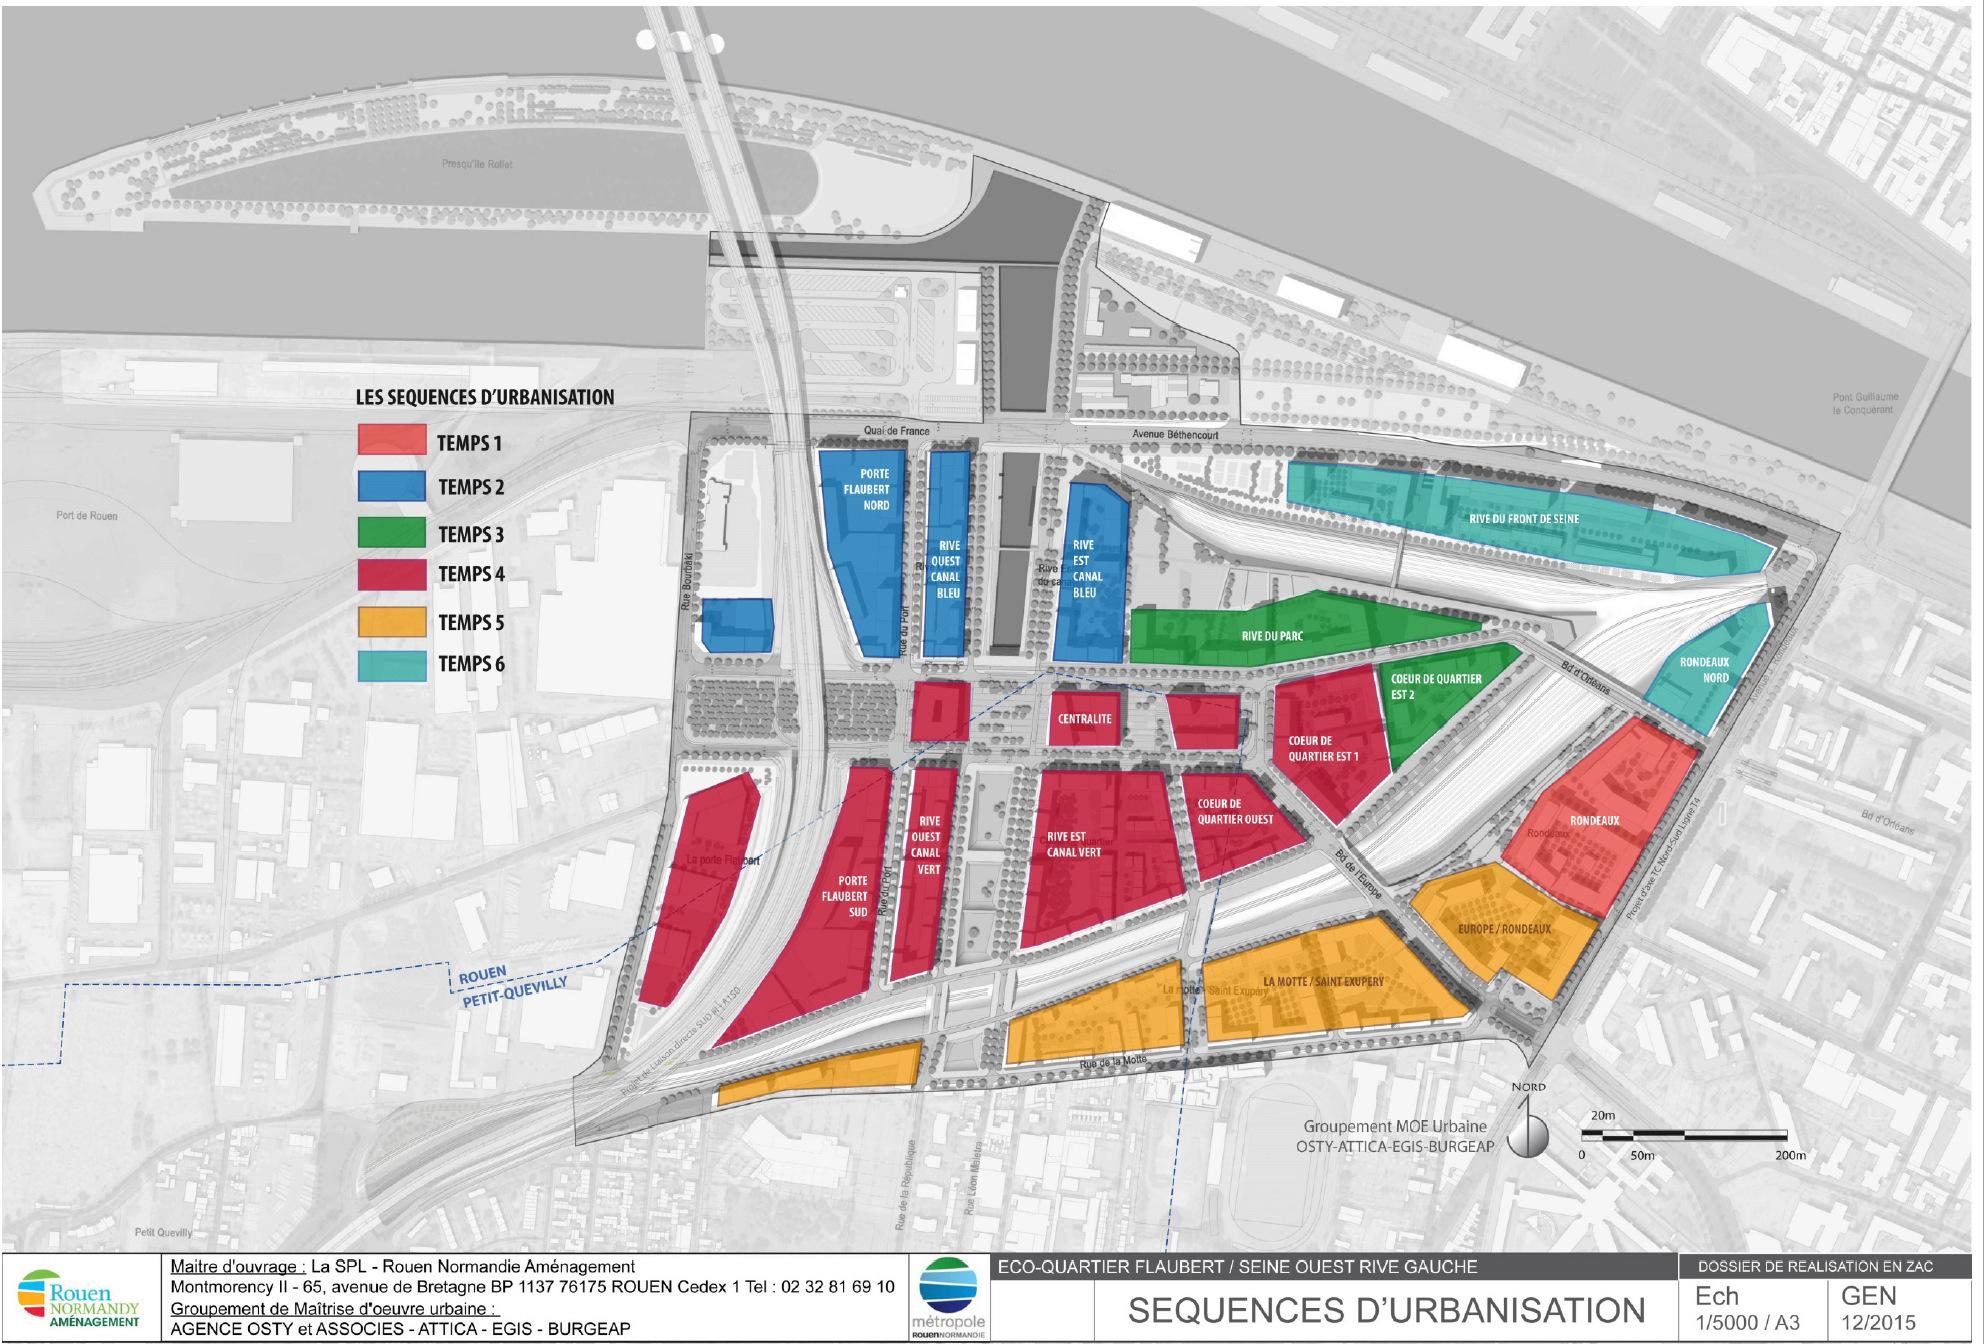 [Bientôt visible sur Google Earth] - Rouen - Ecoquartier Flaubert Ph310